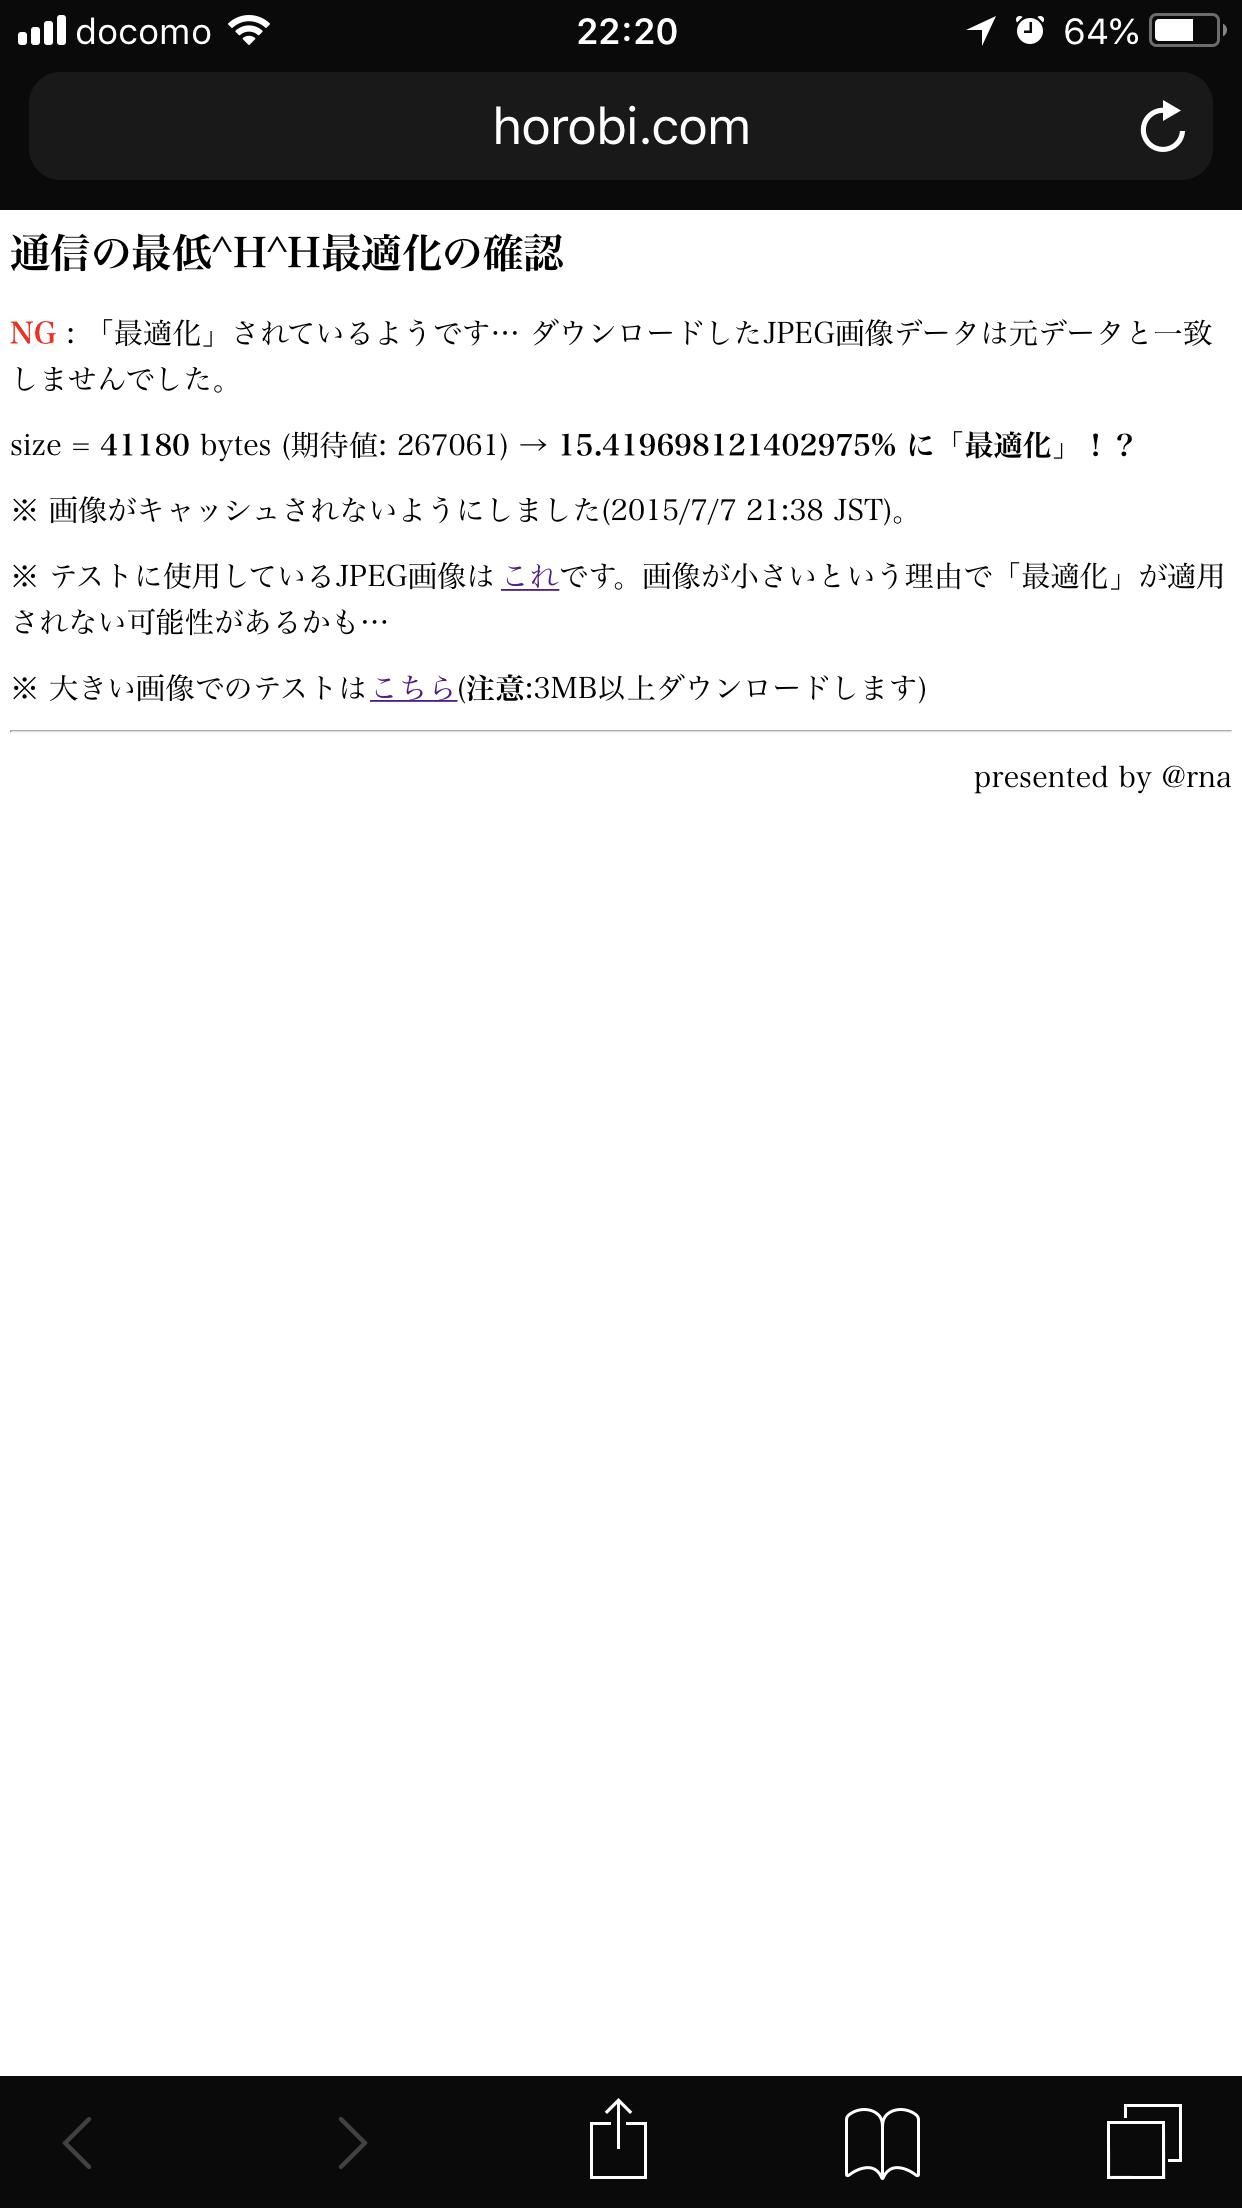 C6144B07-3060-44CD-BCA1-6C5E9AC9605D.png